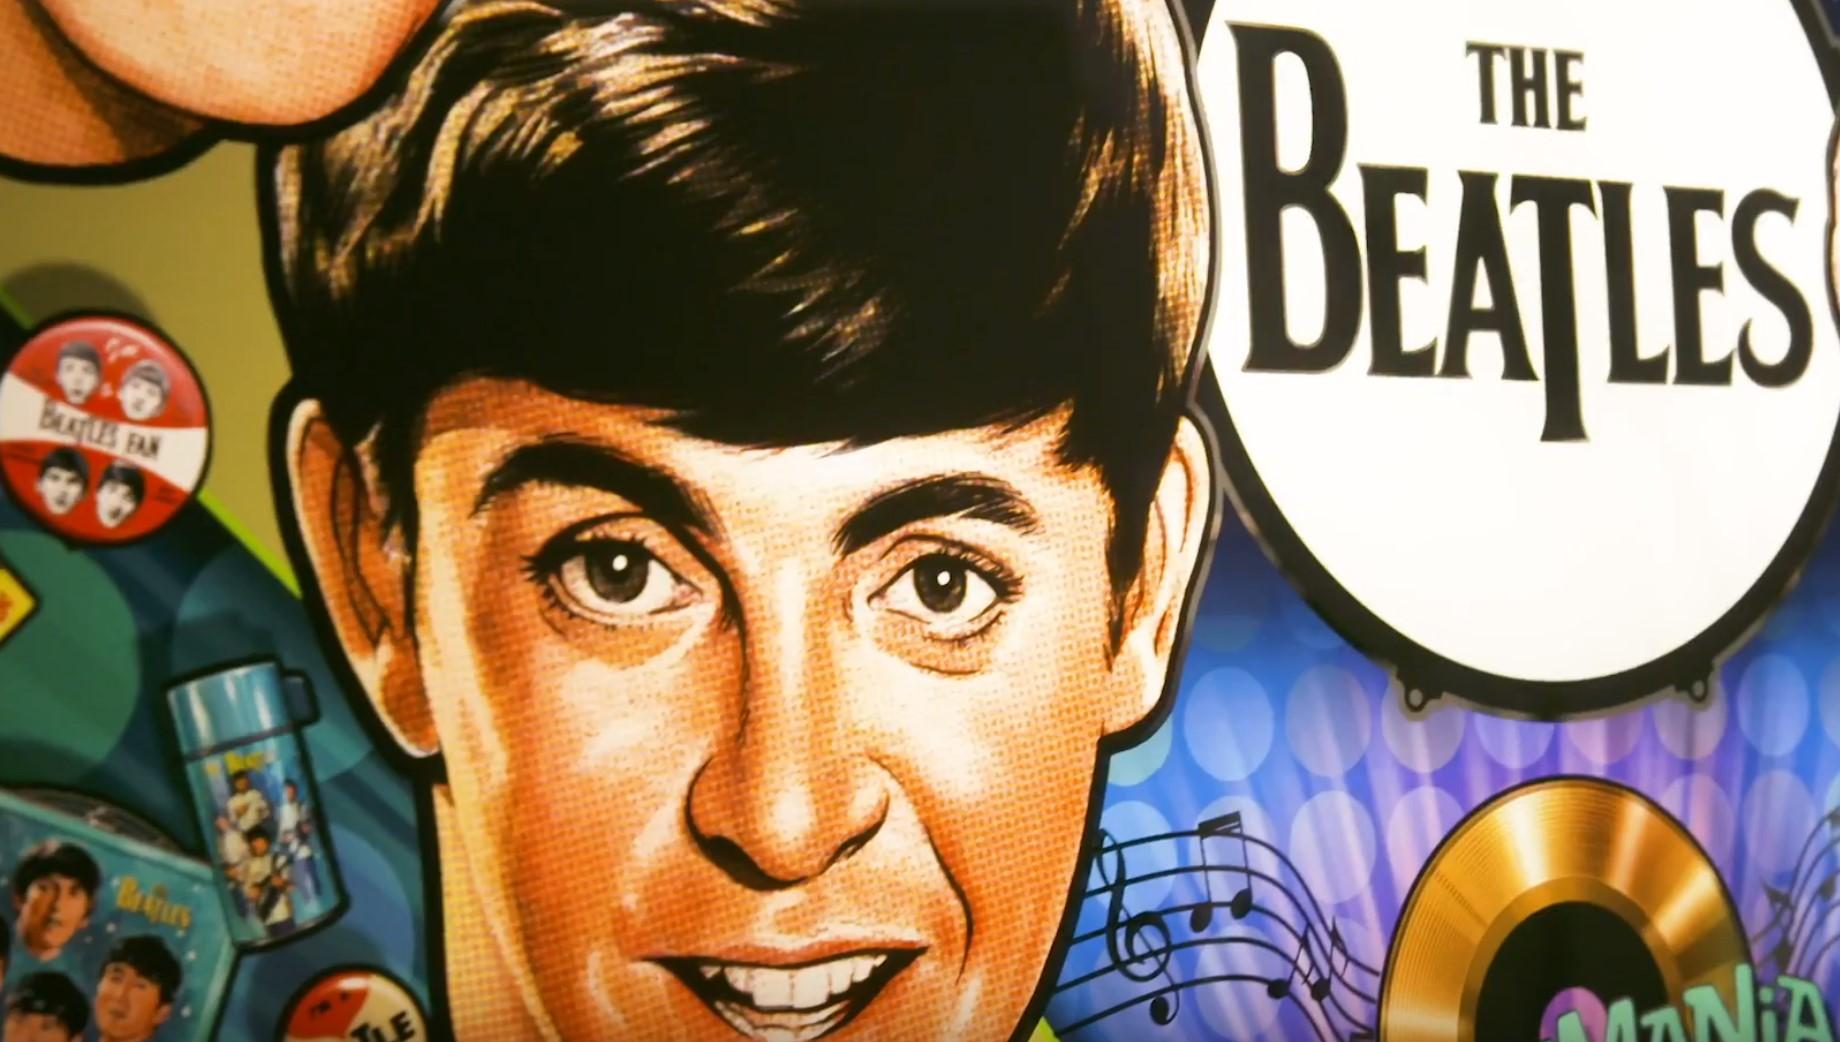 Beatleswitch